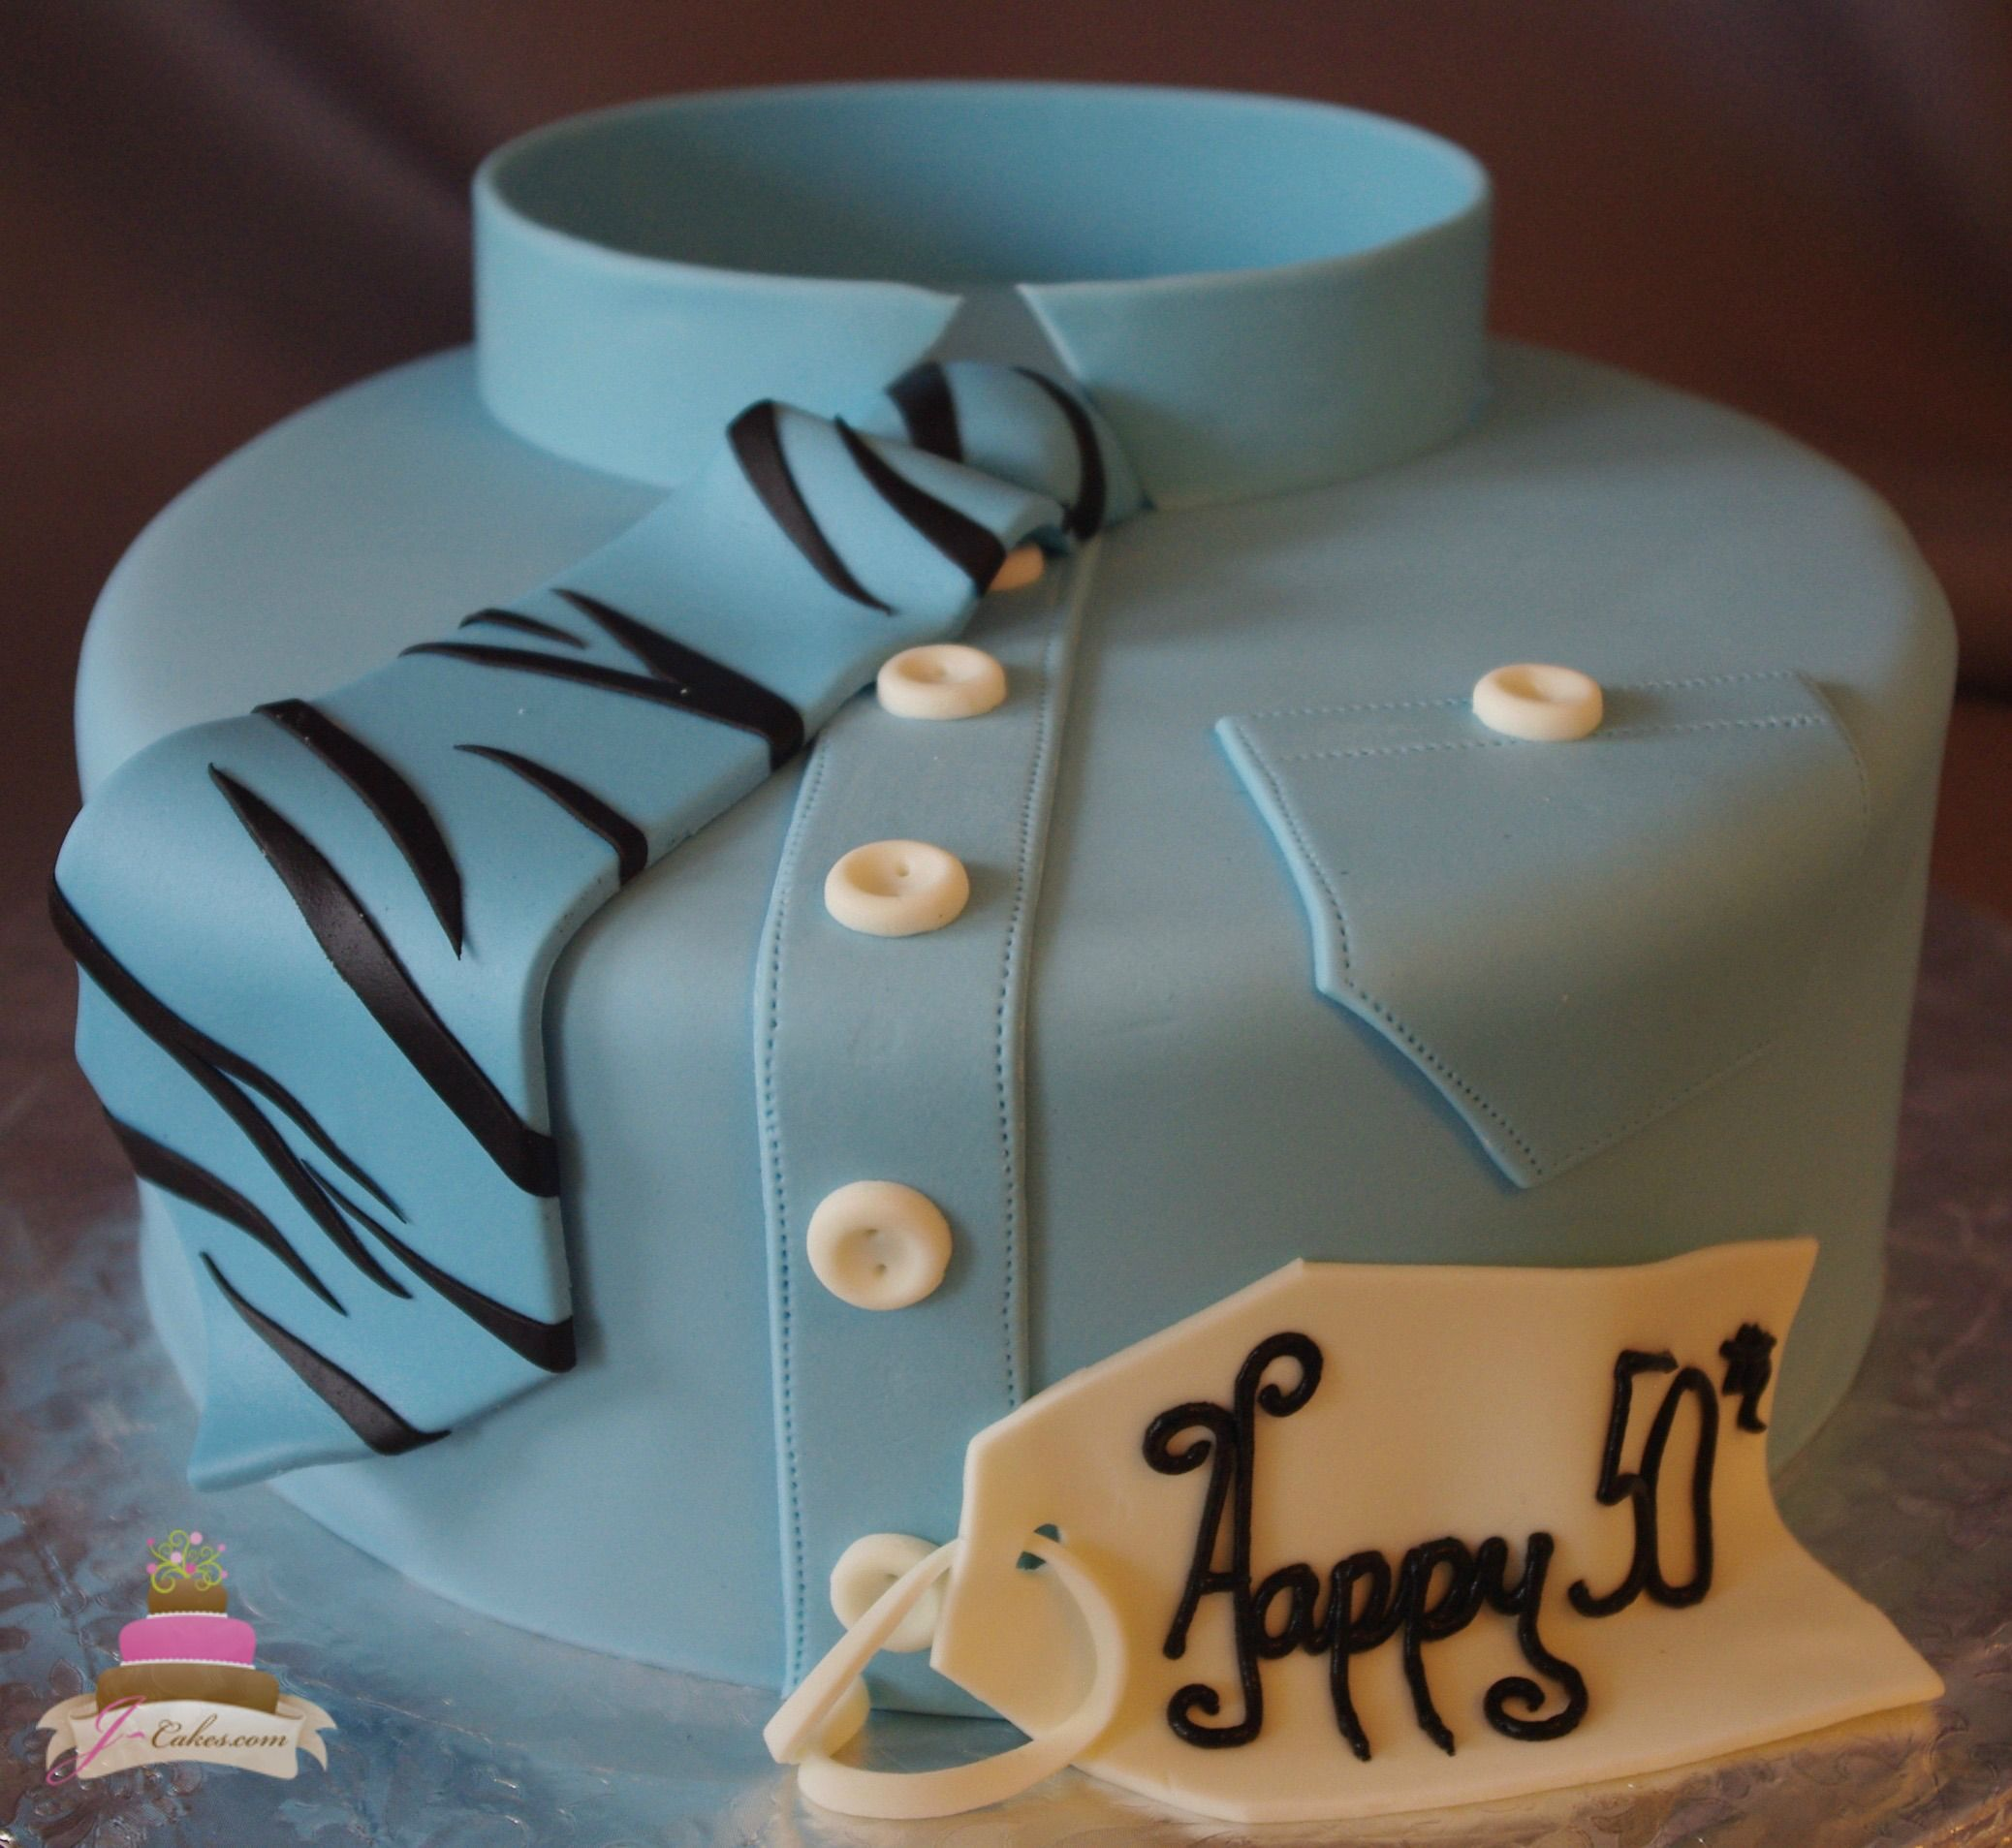 Shirt And Tie Birthday Cake Birthday Cakes Pinterest - Male cakes birthdays